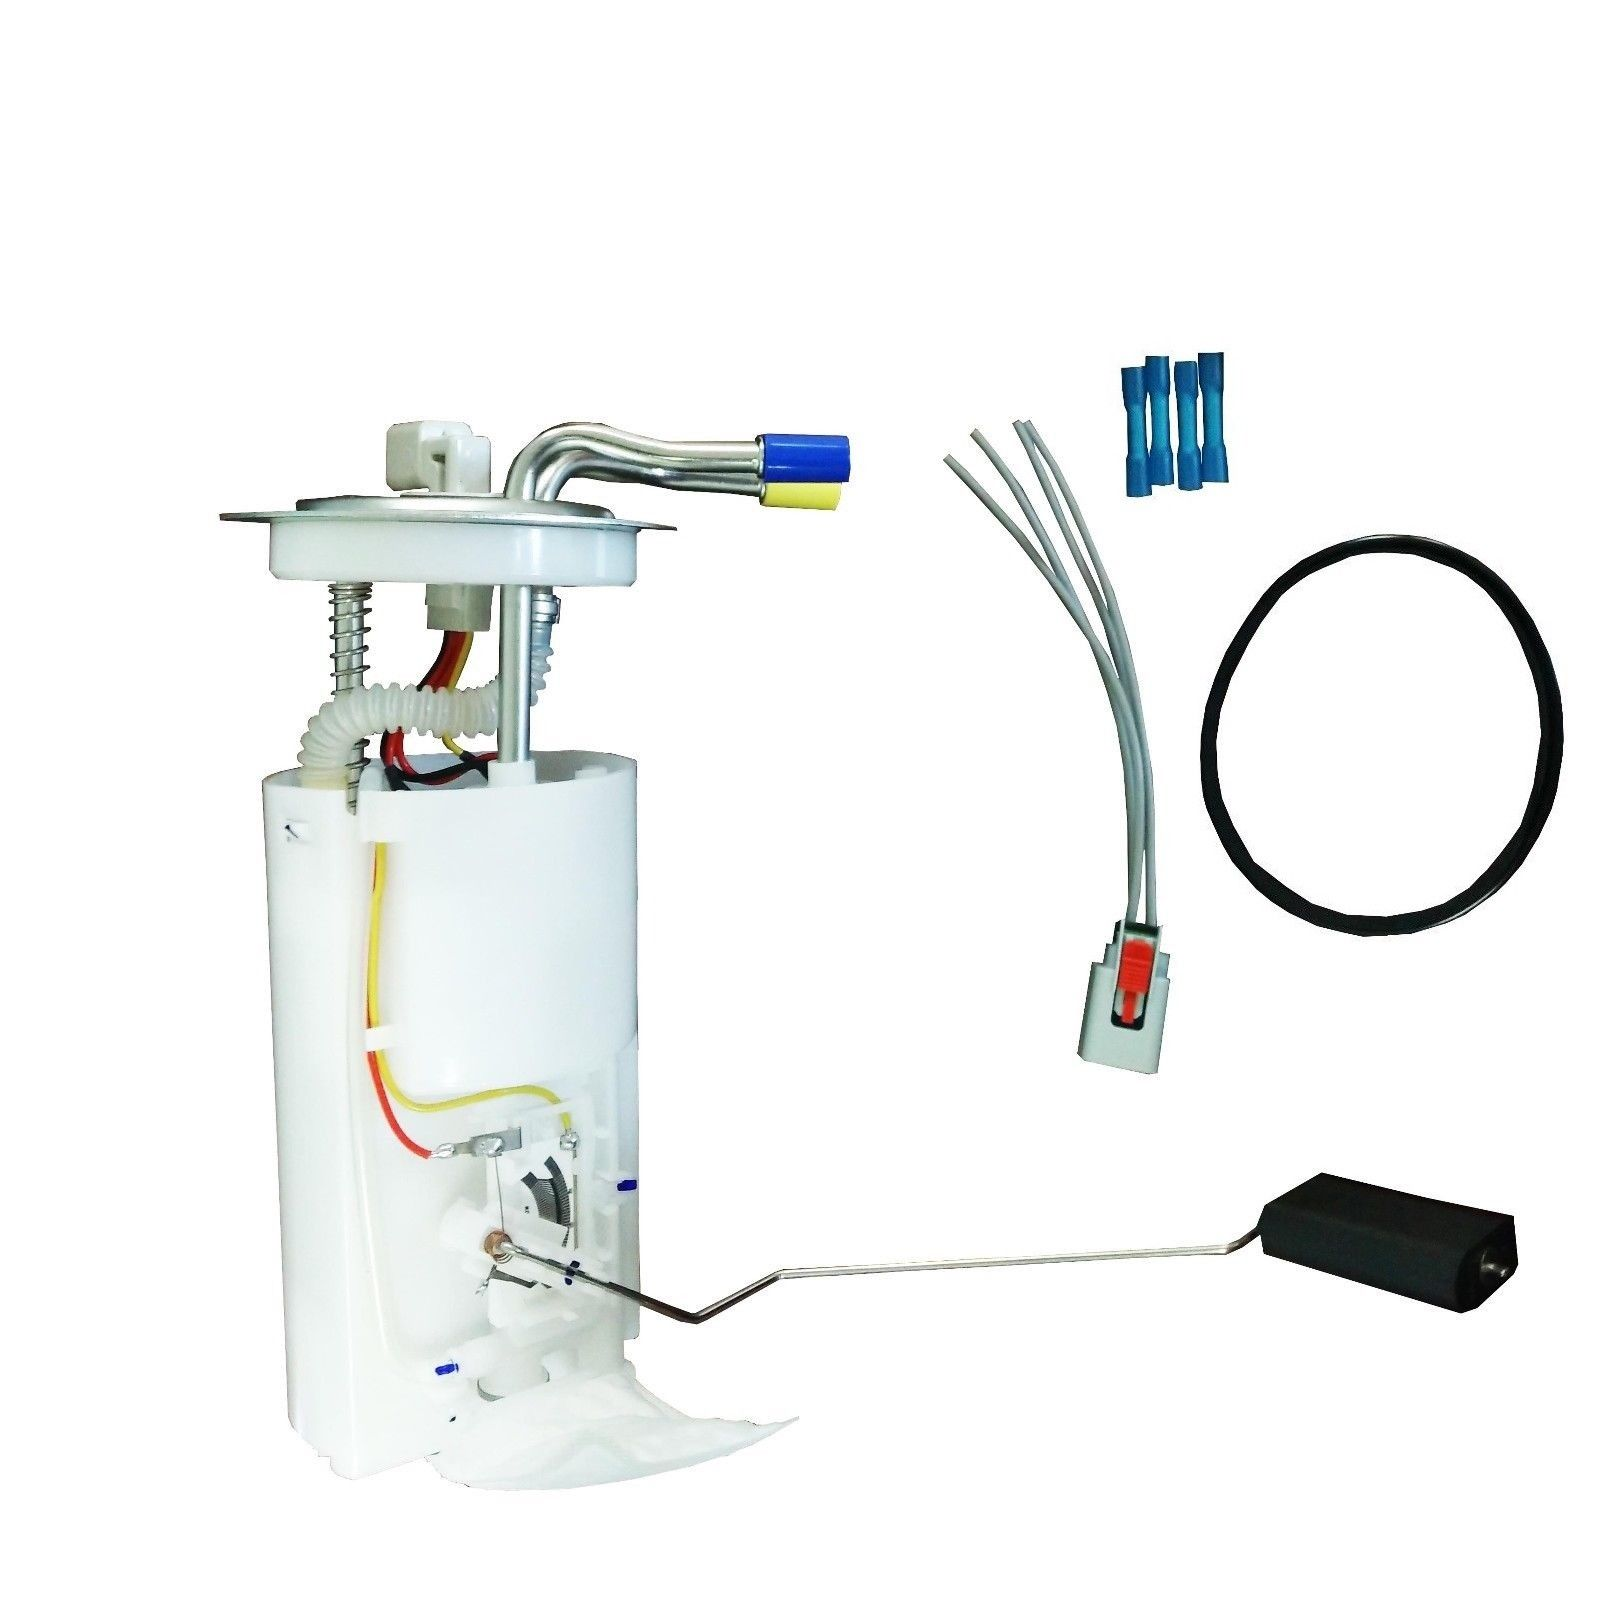 New Fuel Pump Assembly For 04 02 Chevrolet Tahoe Gmc Yukon Flex